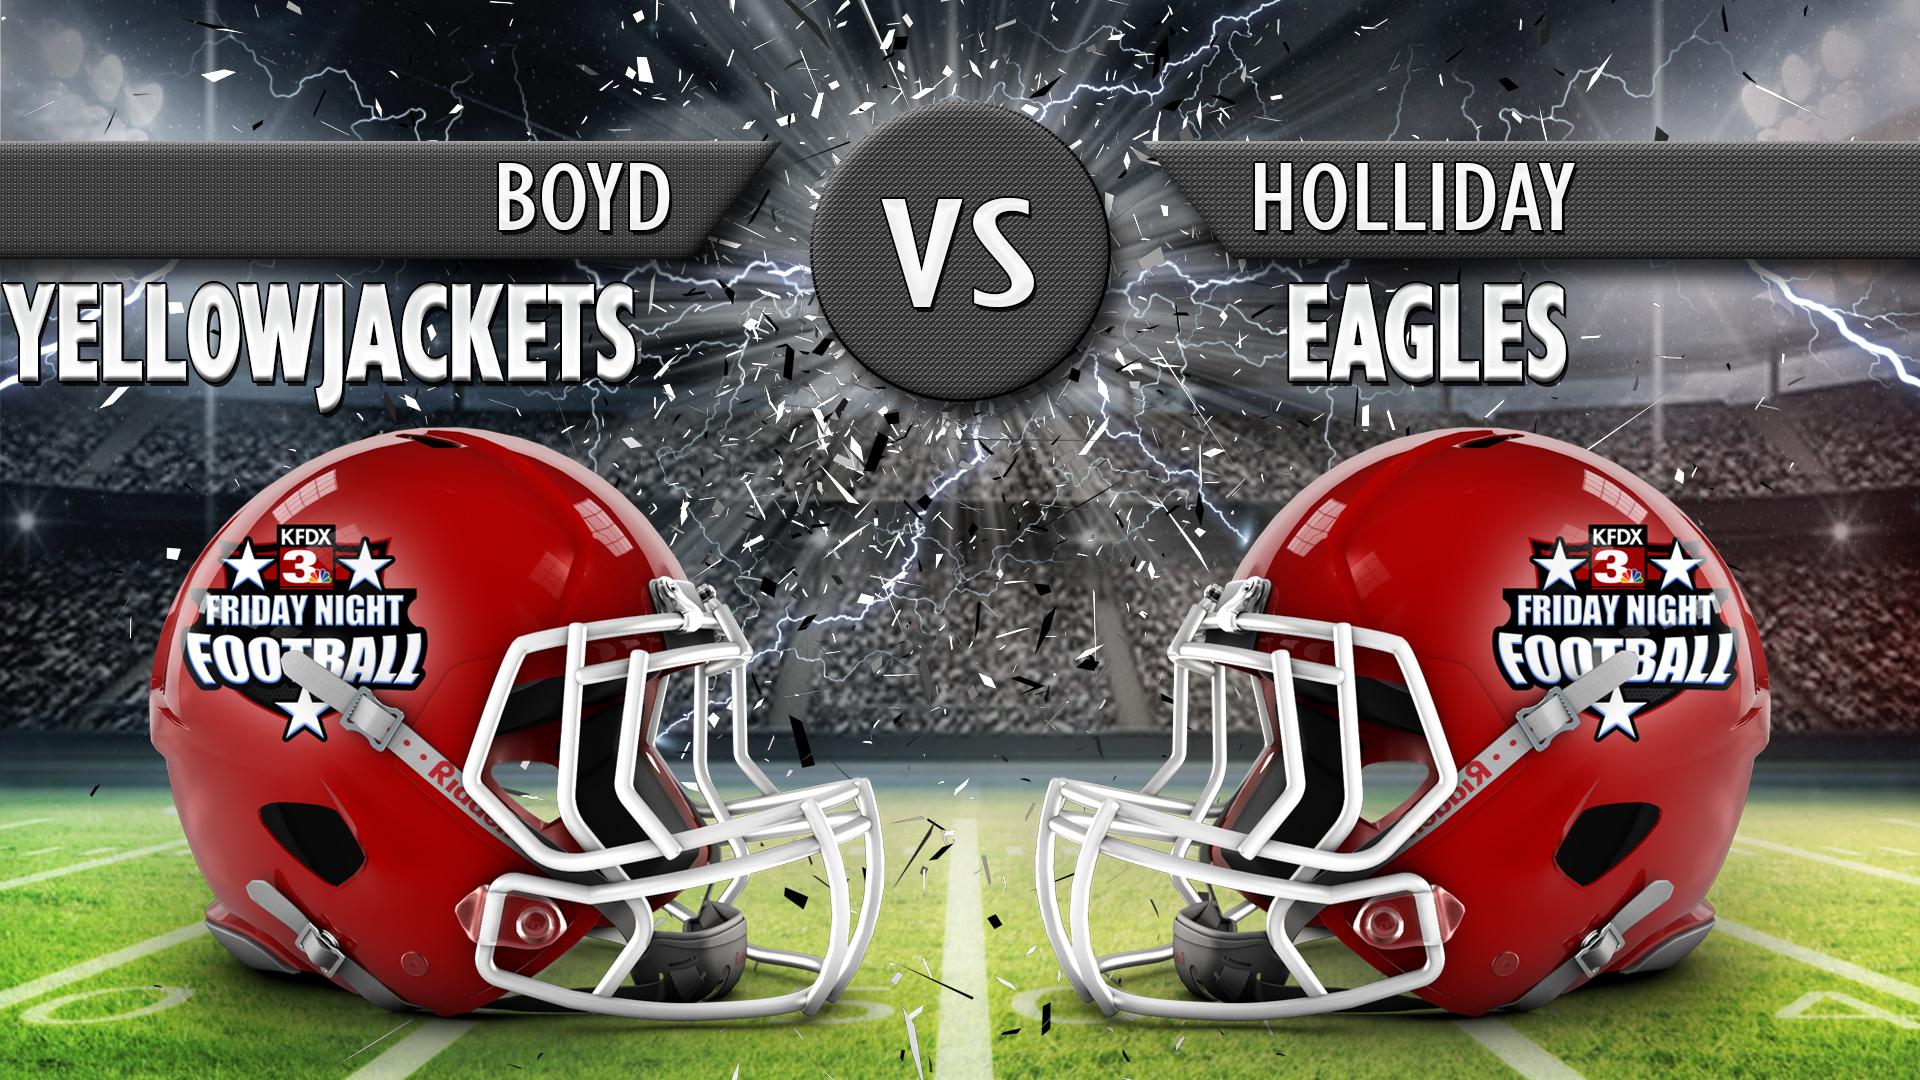 BOYD VS HOLLIDAY_1536333482264.jpg.jpg